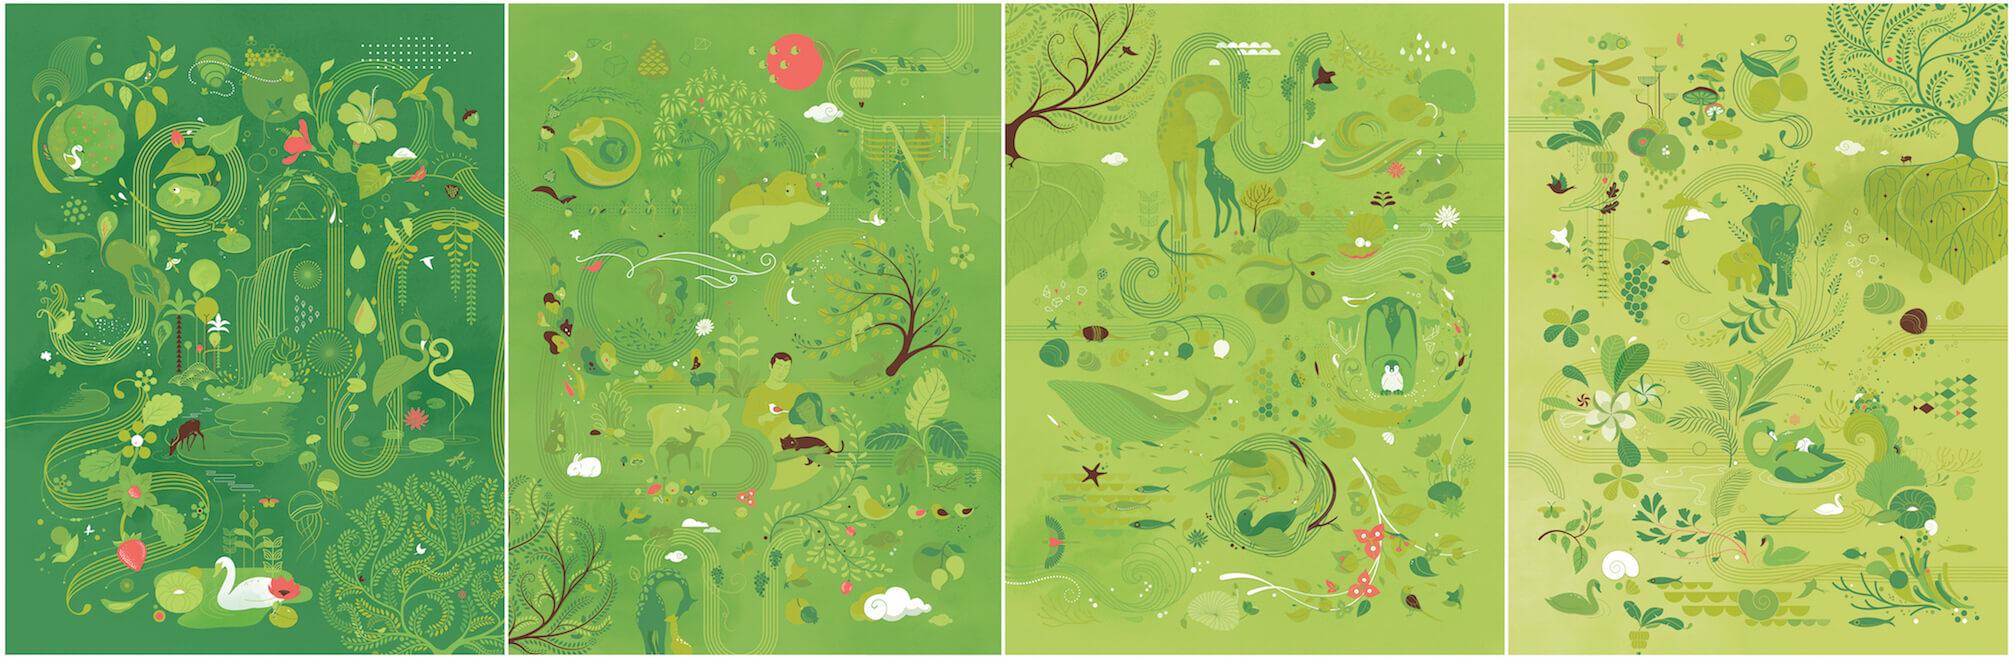 Namaha Illustrations 4.jpg